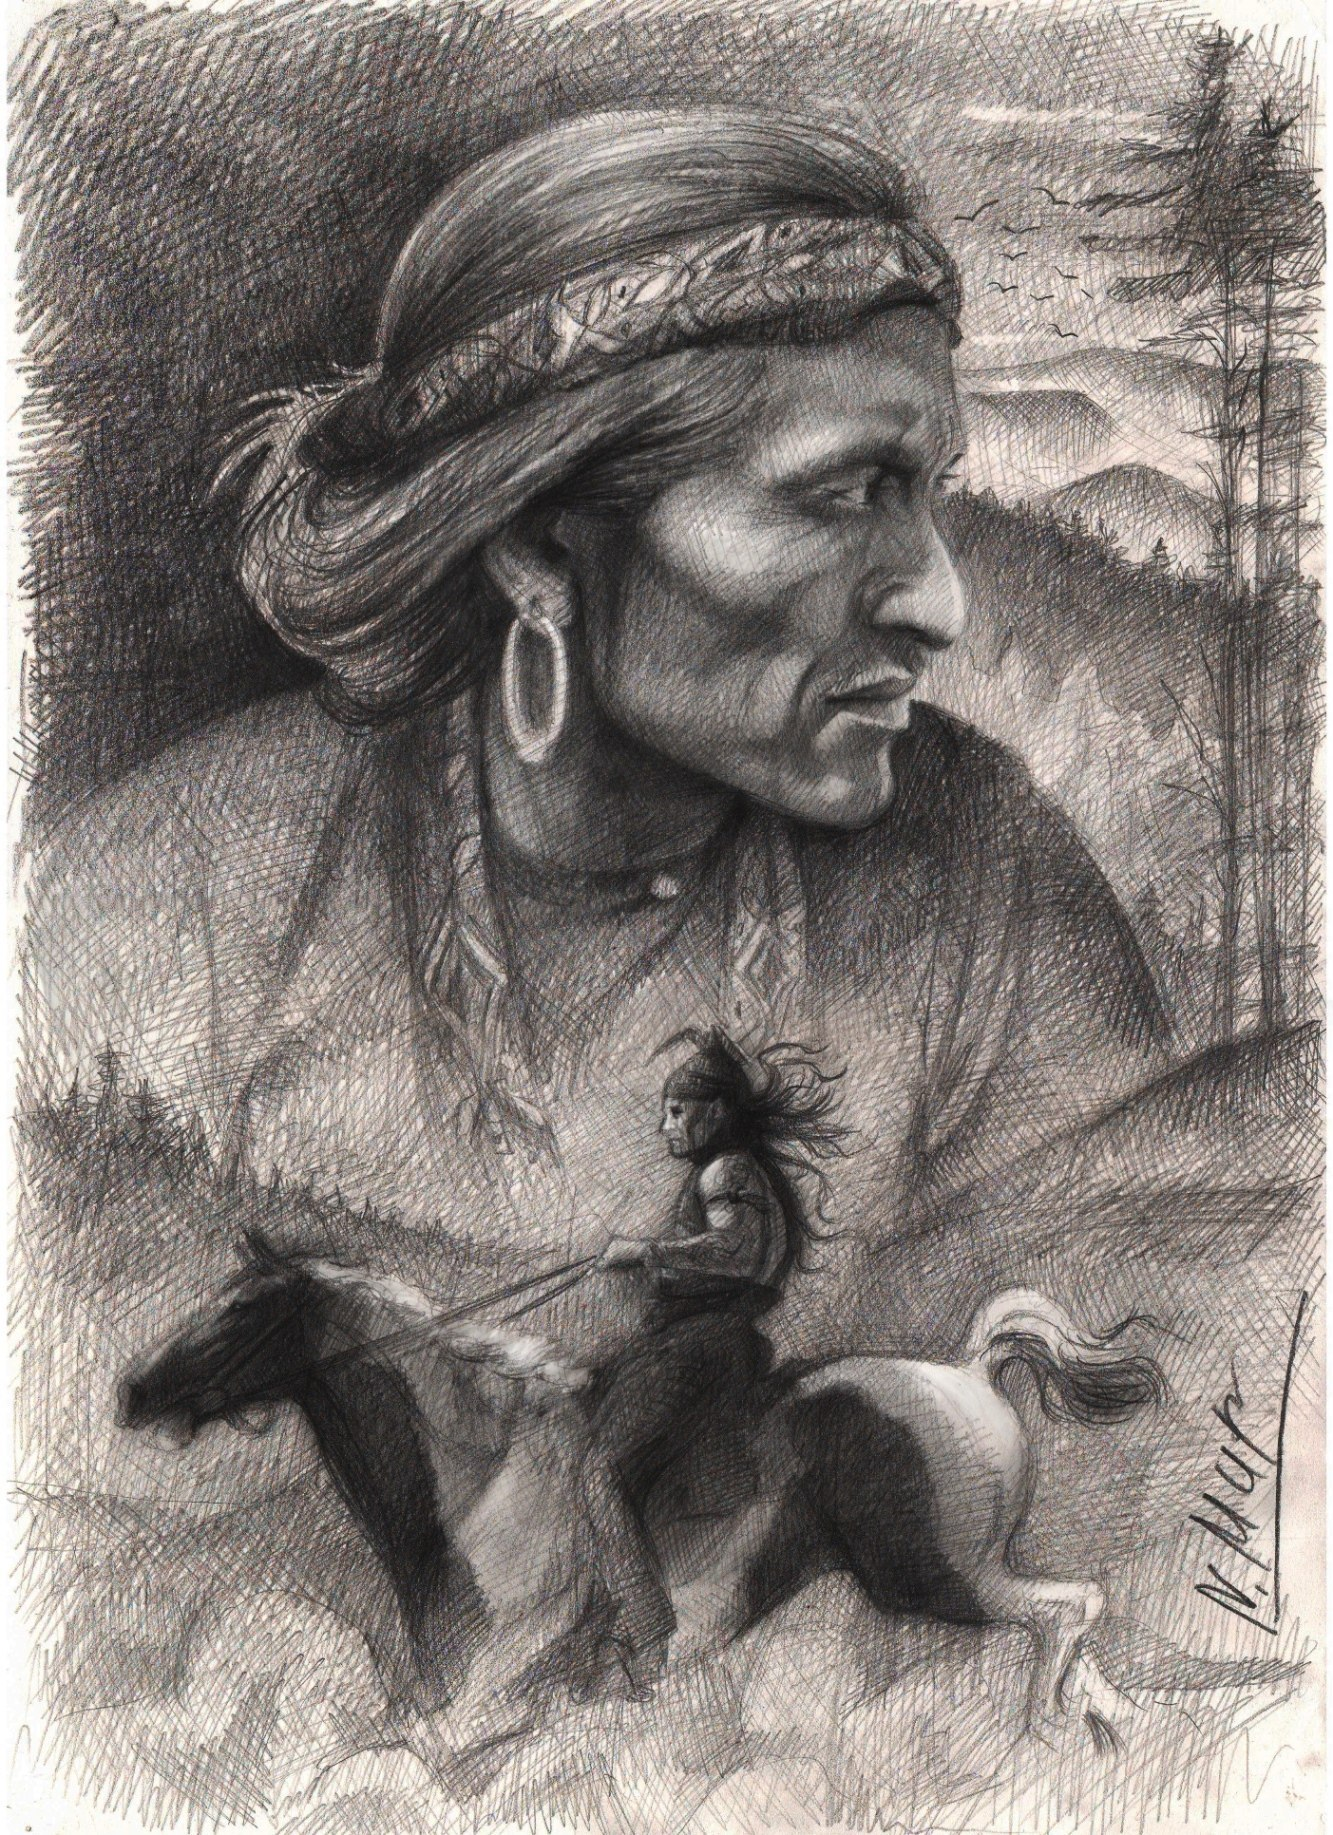 Графические картинки про индейцев